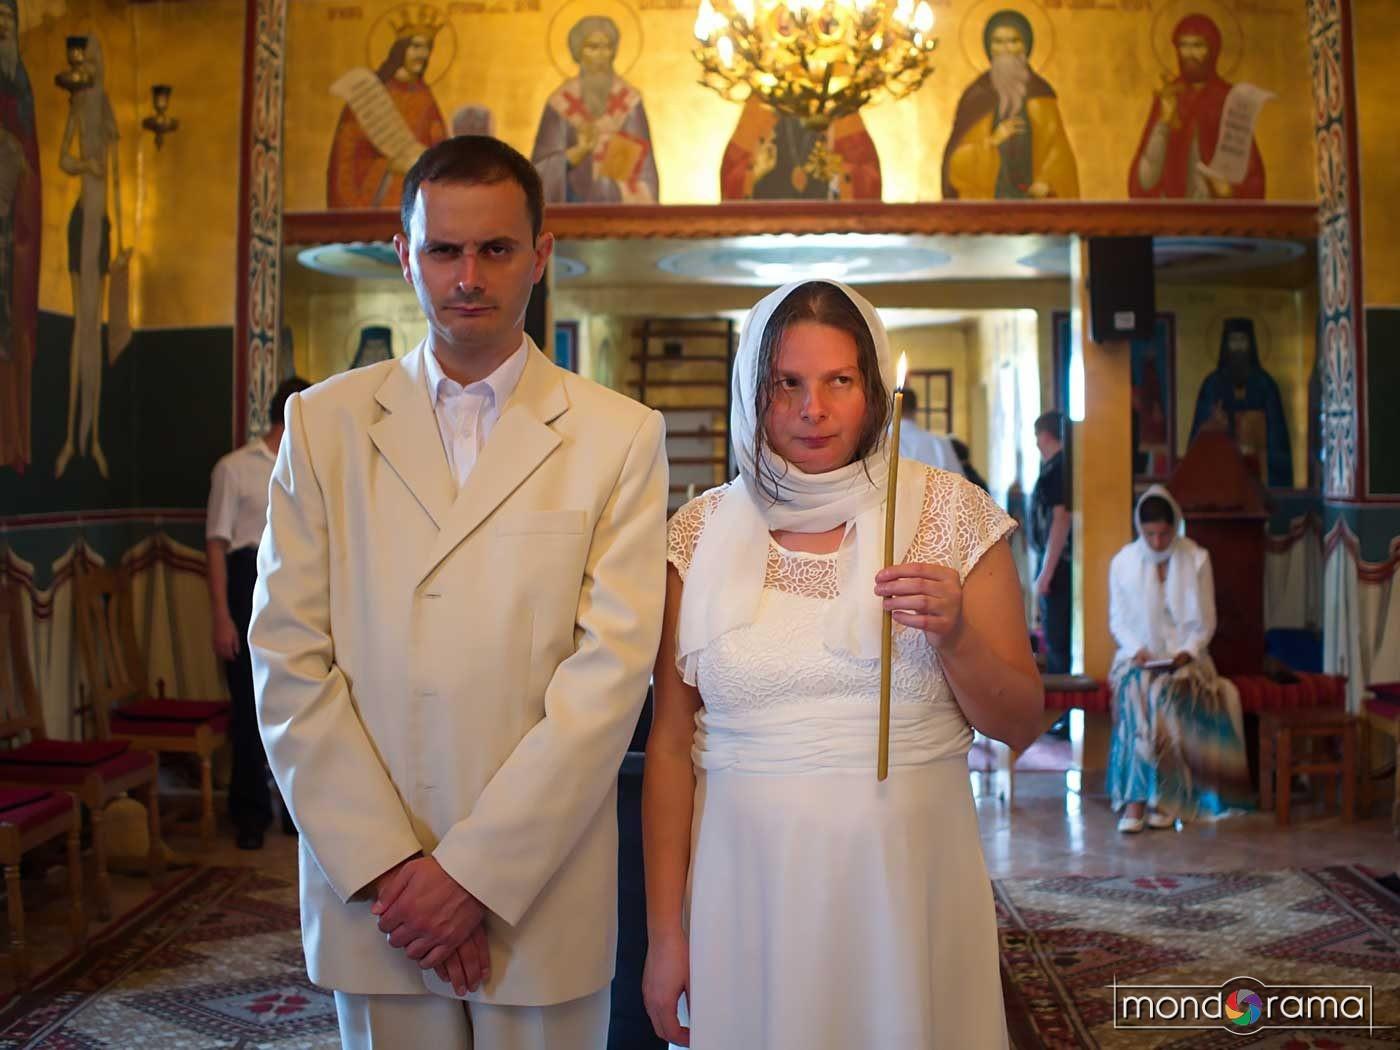 © Remus Tiplea - Confesiuni religioase, Casatorie (ortodoxie), Mesteacan, 2013